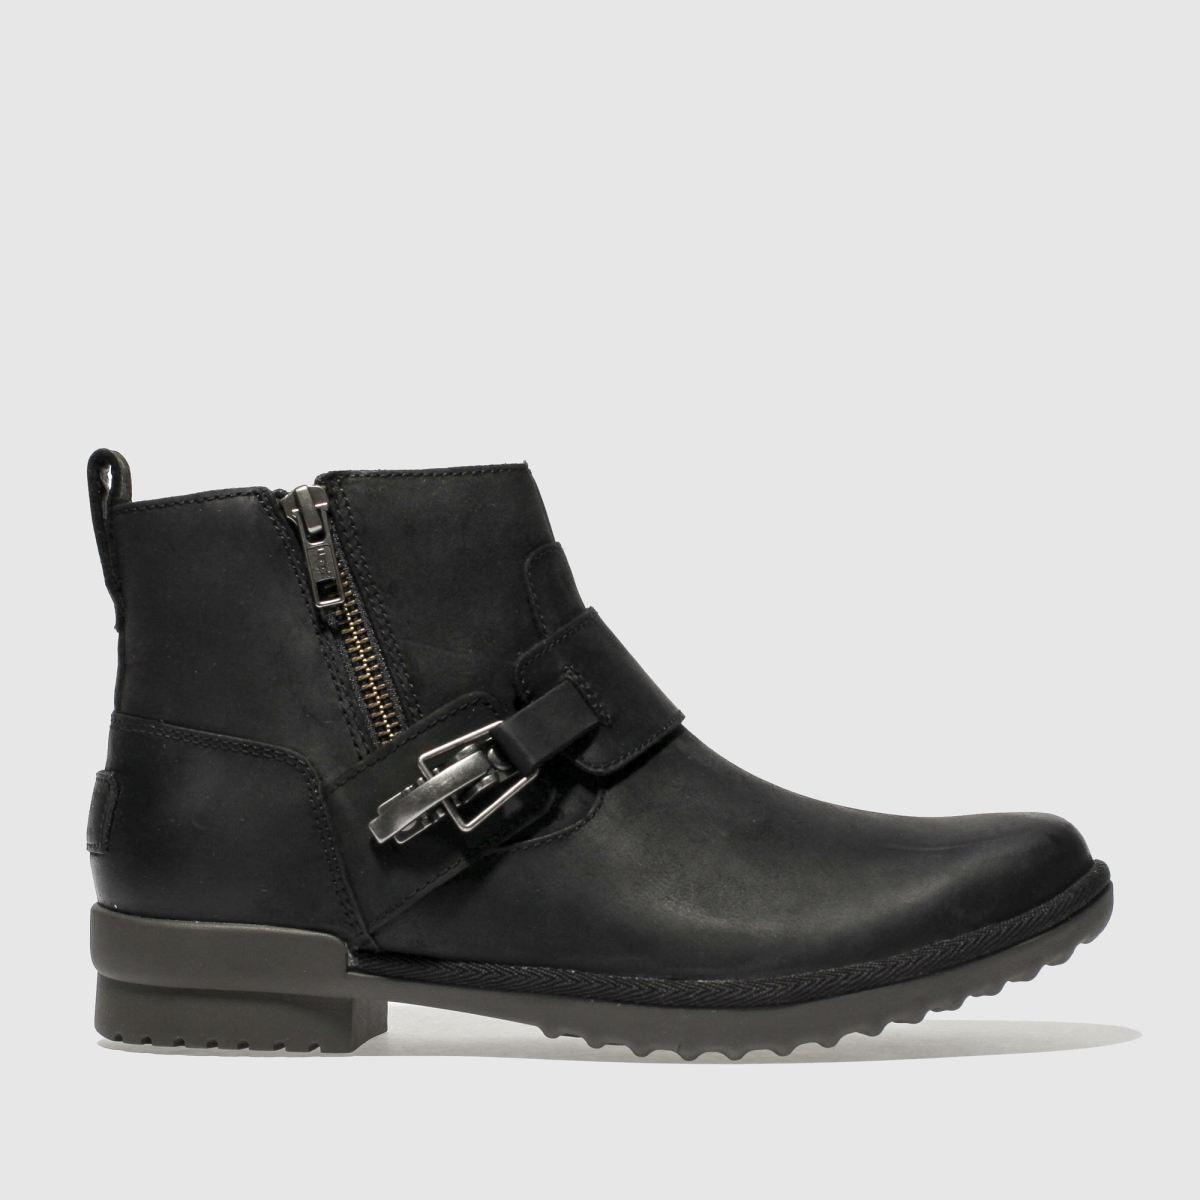 Ugg Black Cheyne Boots